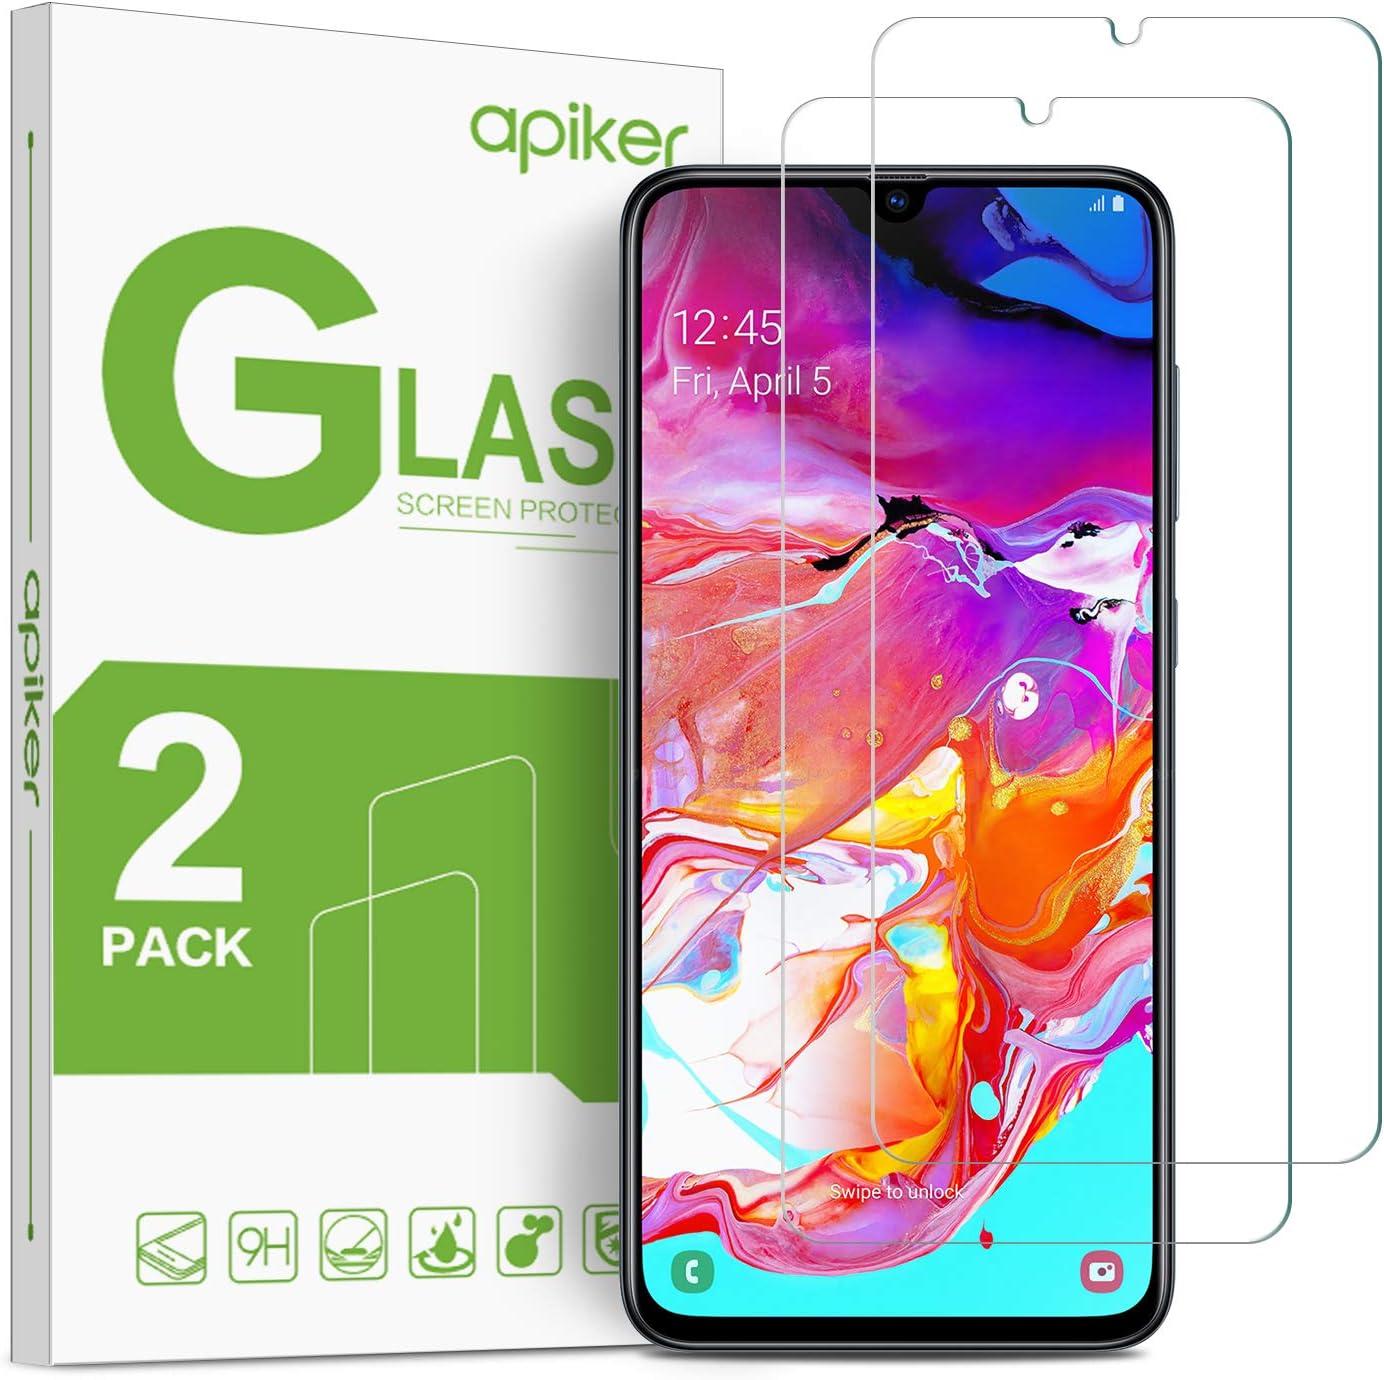 apiker [2-Pack Cristal Templado Completa Compatible con Samsung Galaxy A70, Protector Pantalla Completa para Samsung Galaxy A70, Vidrio Templado Completa con [Alta Definición] [Anti- Arañazo]: Amazon.es: Electrónica